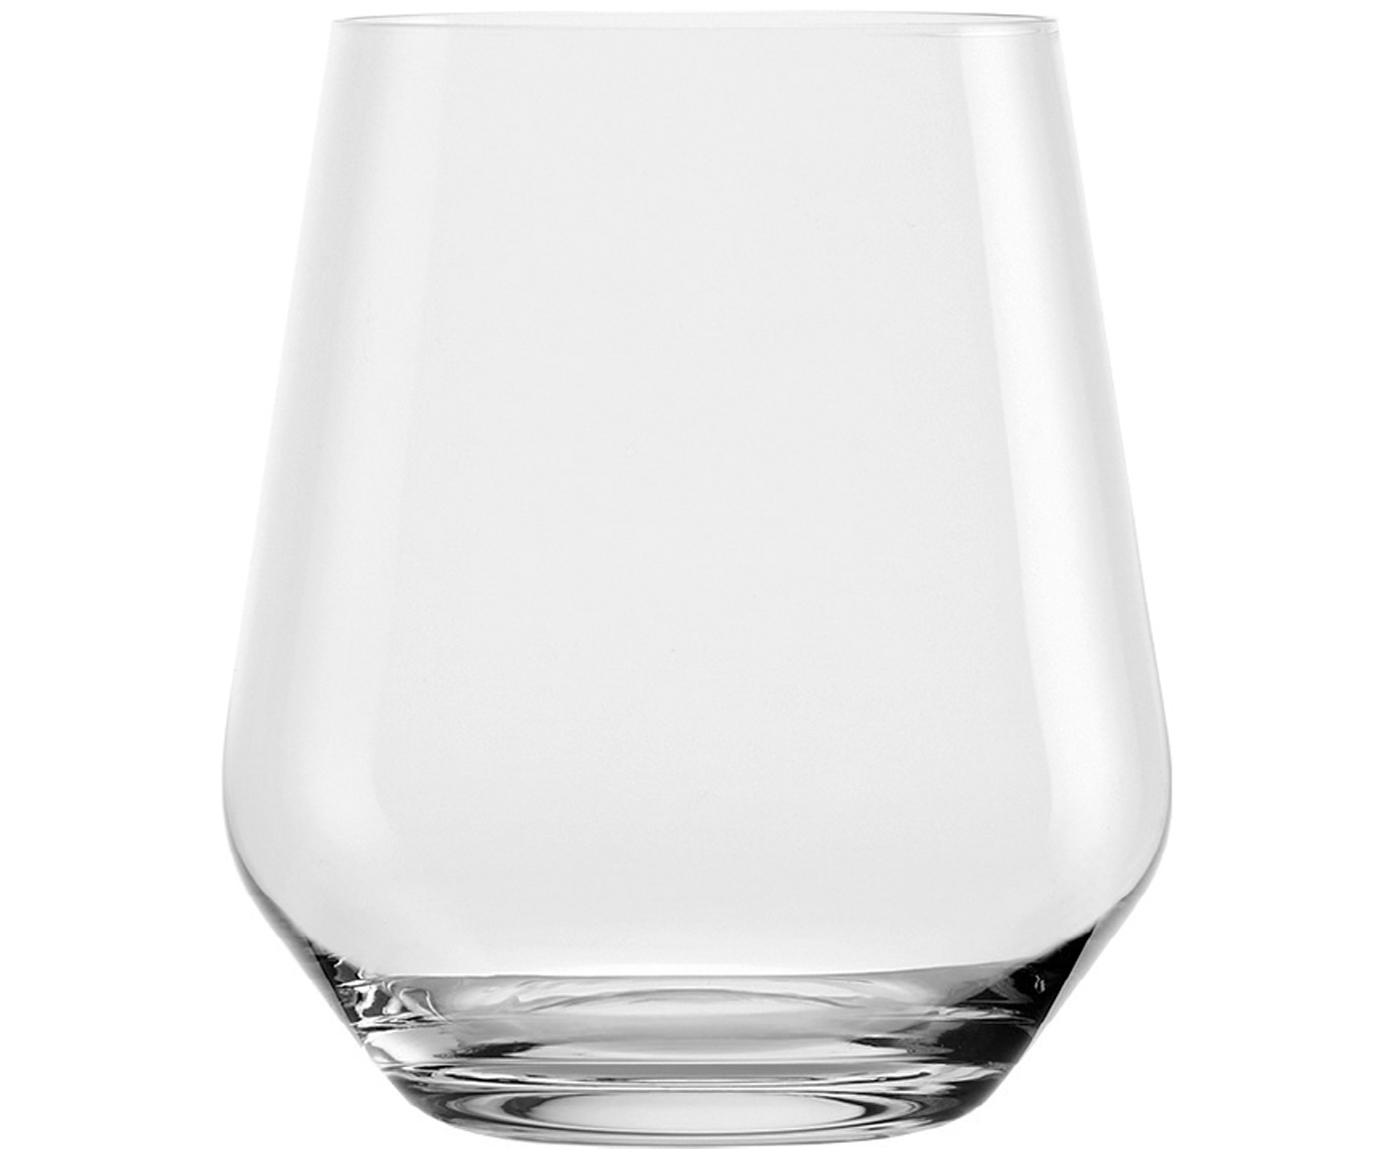 Bauchige Kristall-Wassergläser Revolution, 6er-Set, Kristallglas, Transparent, Ø 9 x H 11 cm